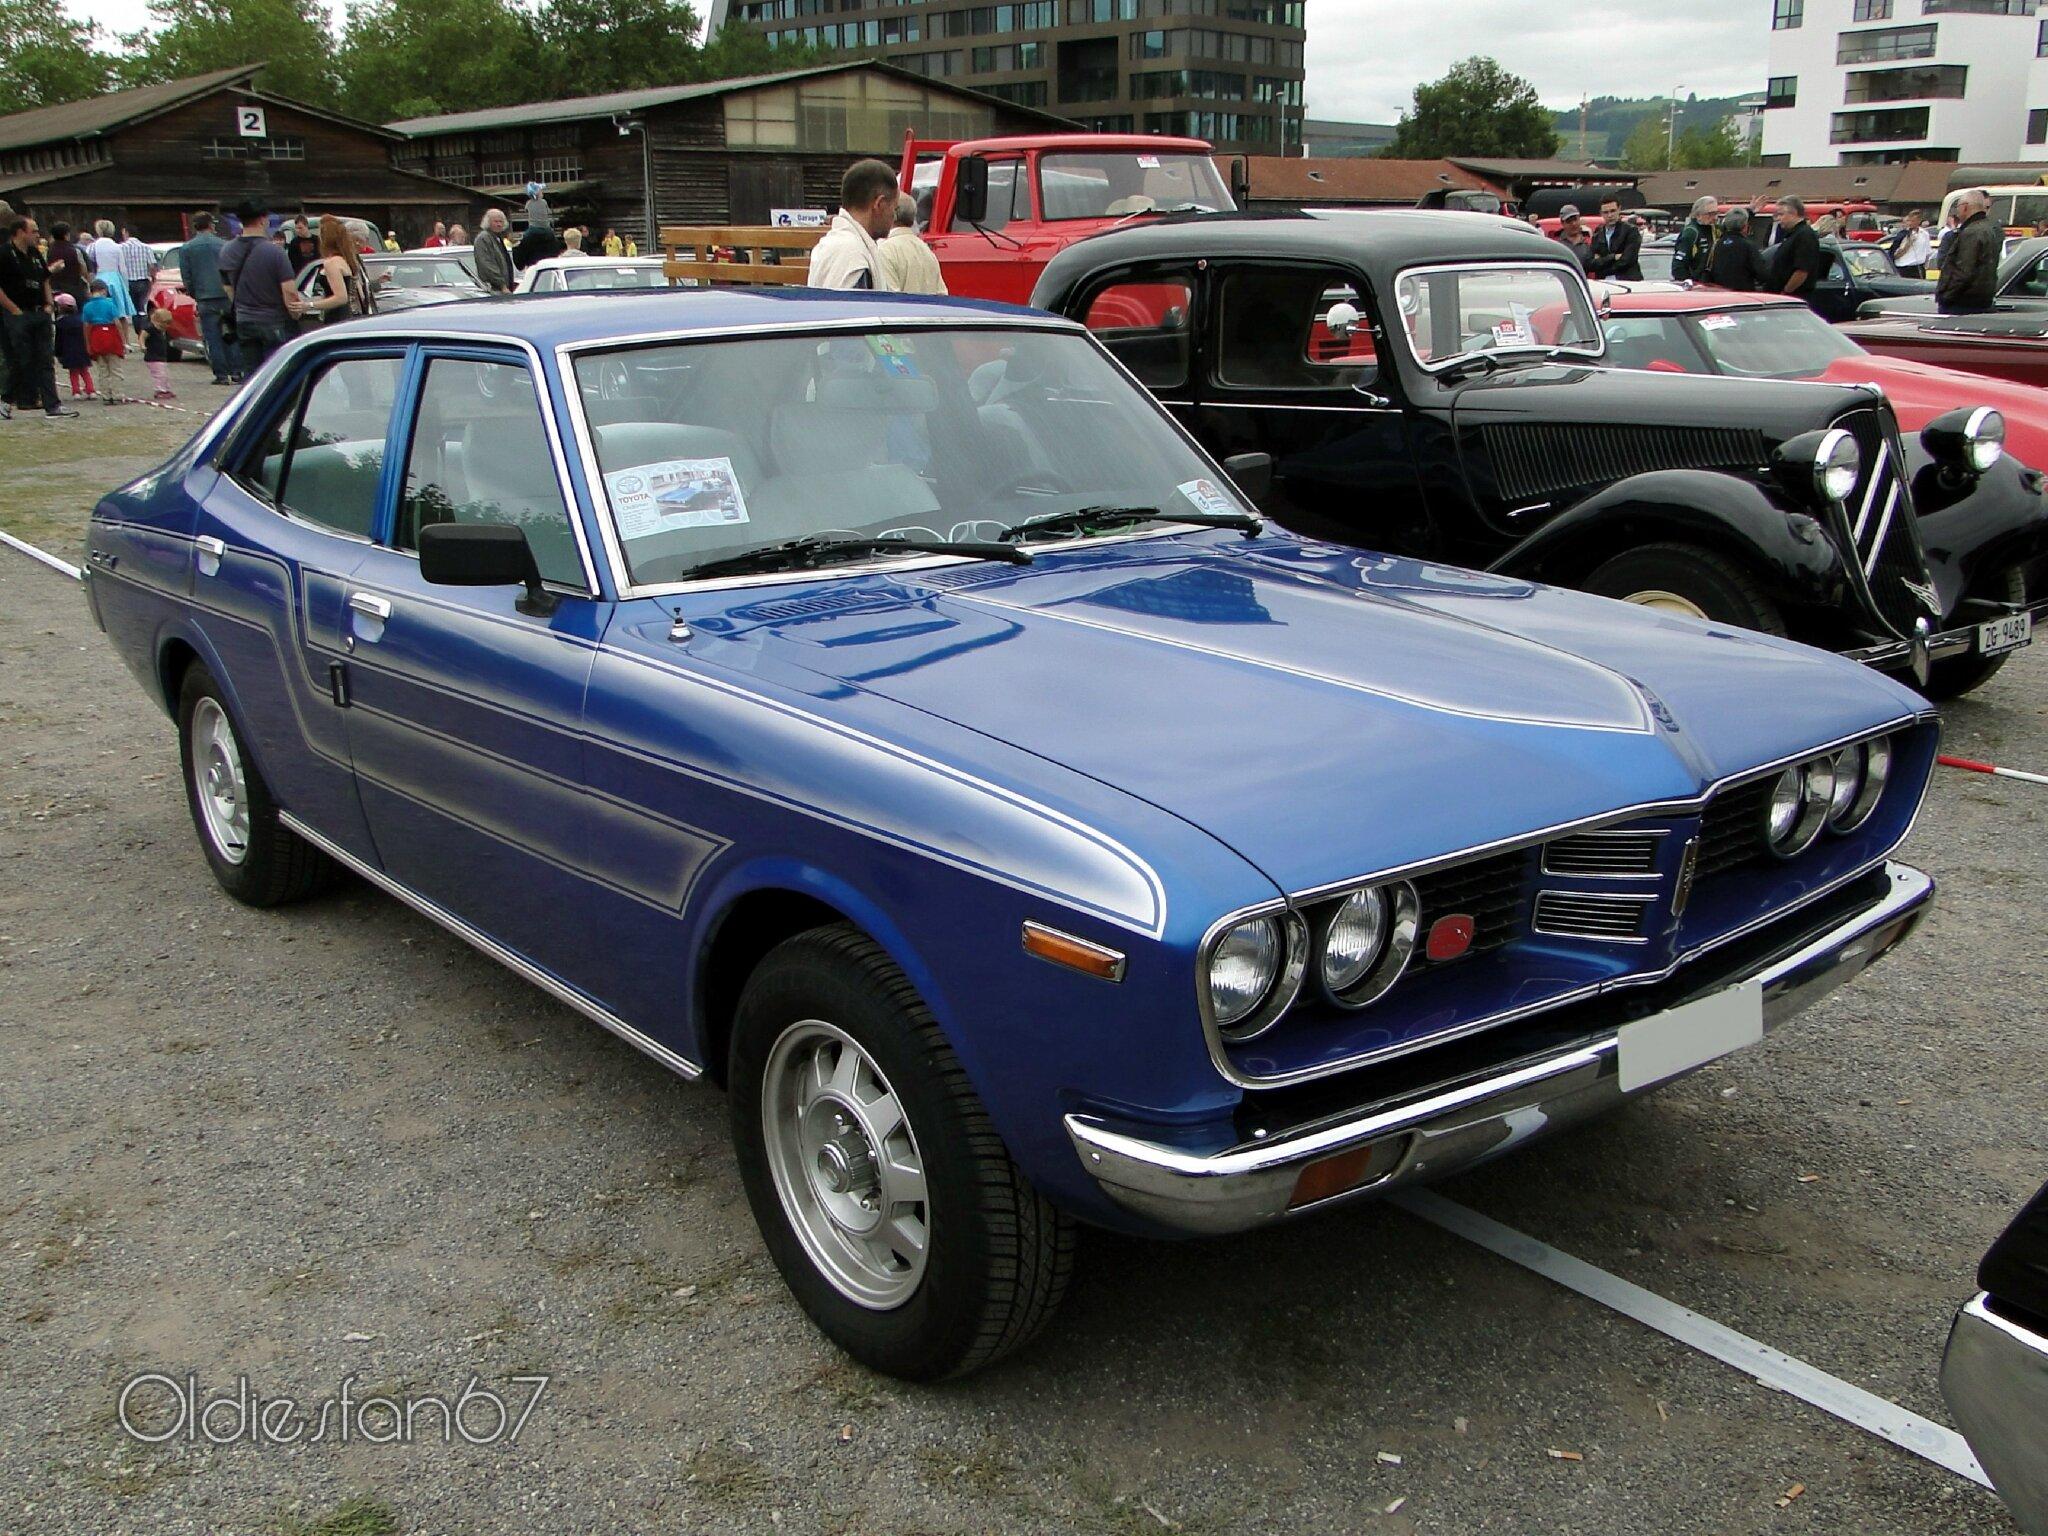 Toyota corona mark ii 1972 1976 oldiesfan67 quot mon blog auto quot